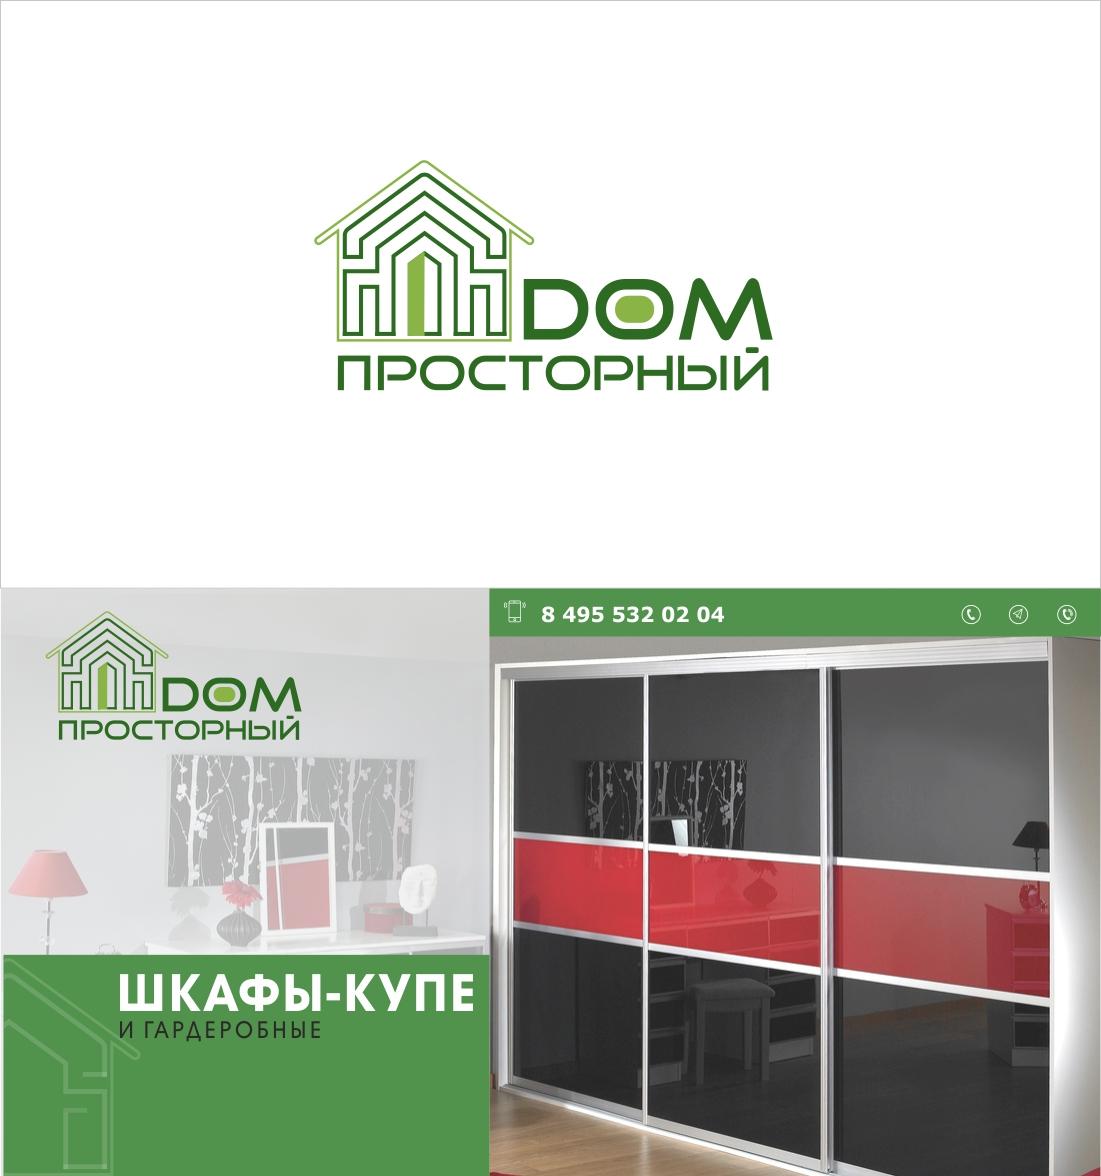 Логотип и фирменный стиль для компании по шкафам-купе фото f_1985b6db045bed36.jpg